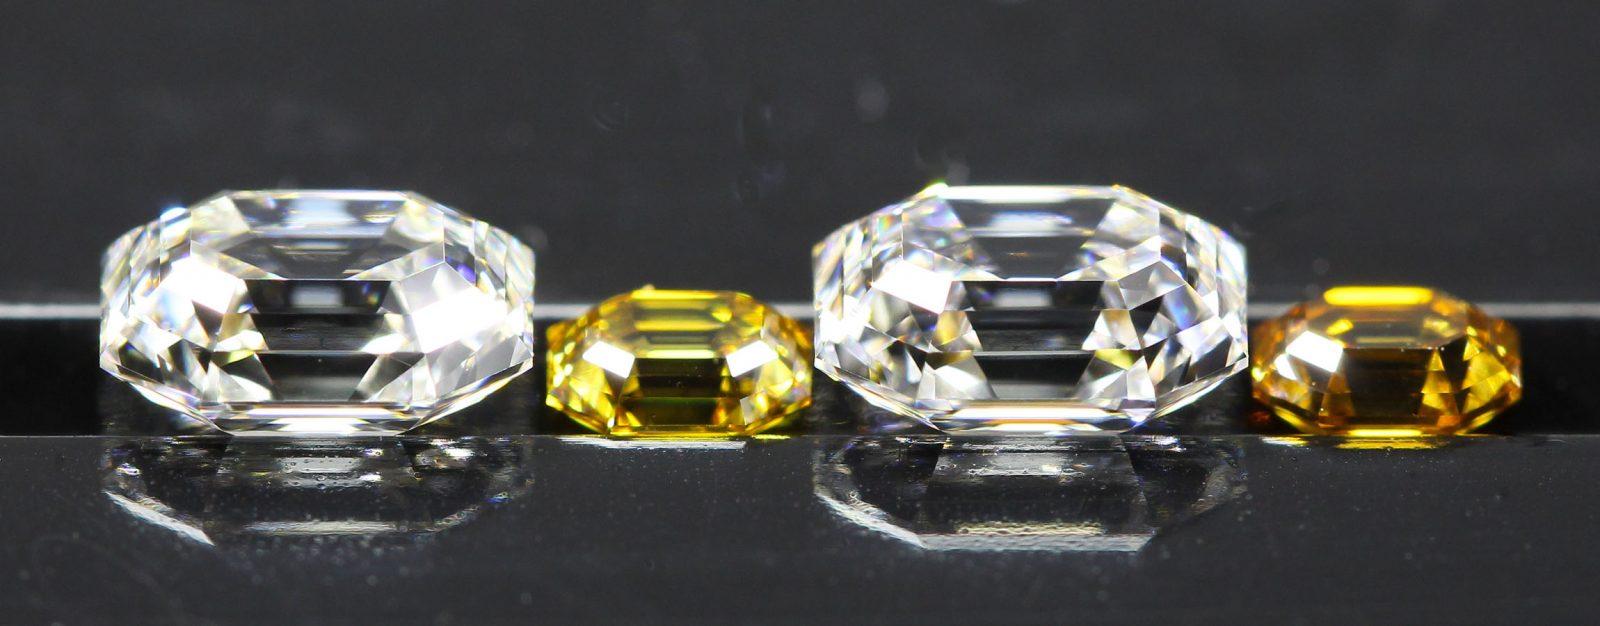 Two pairs of elongated Emerald Cut Diamonds